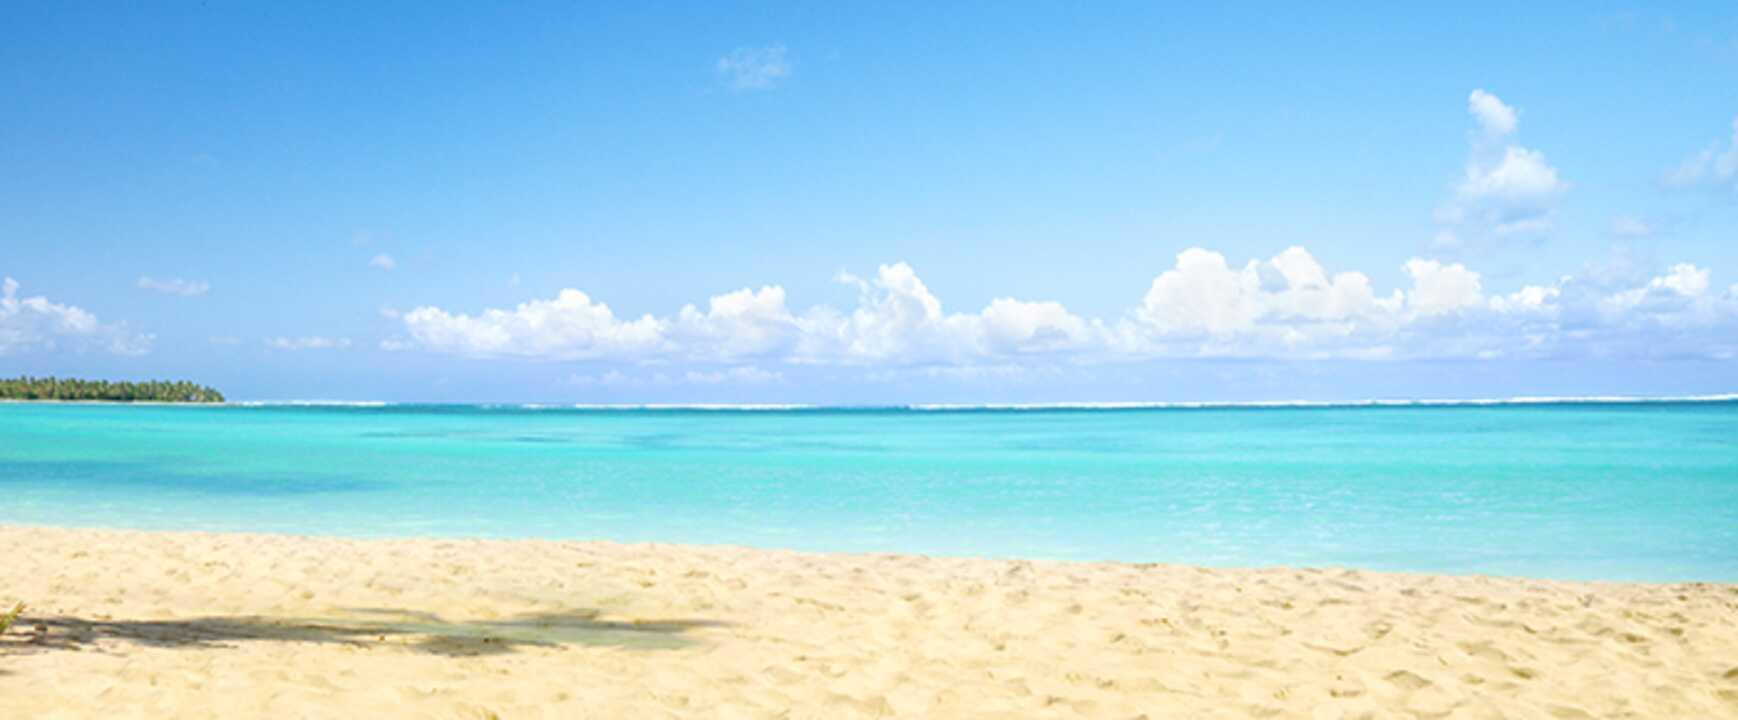 Playa del Carmen Holidays